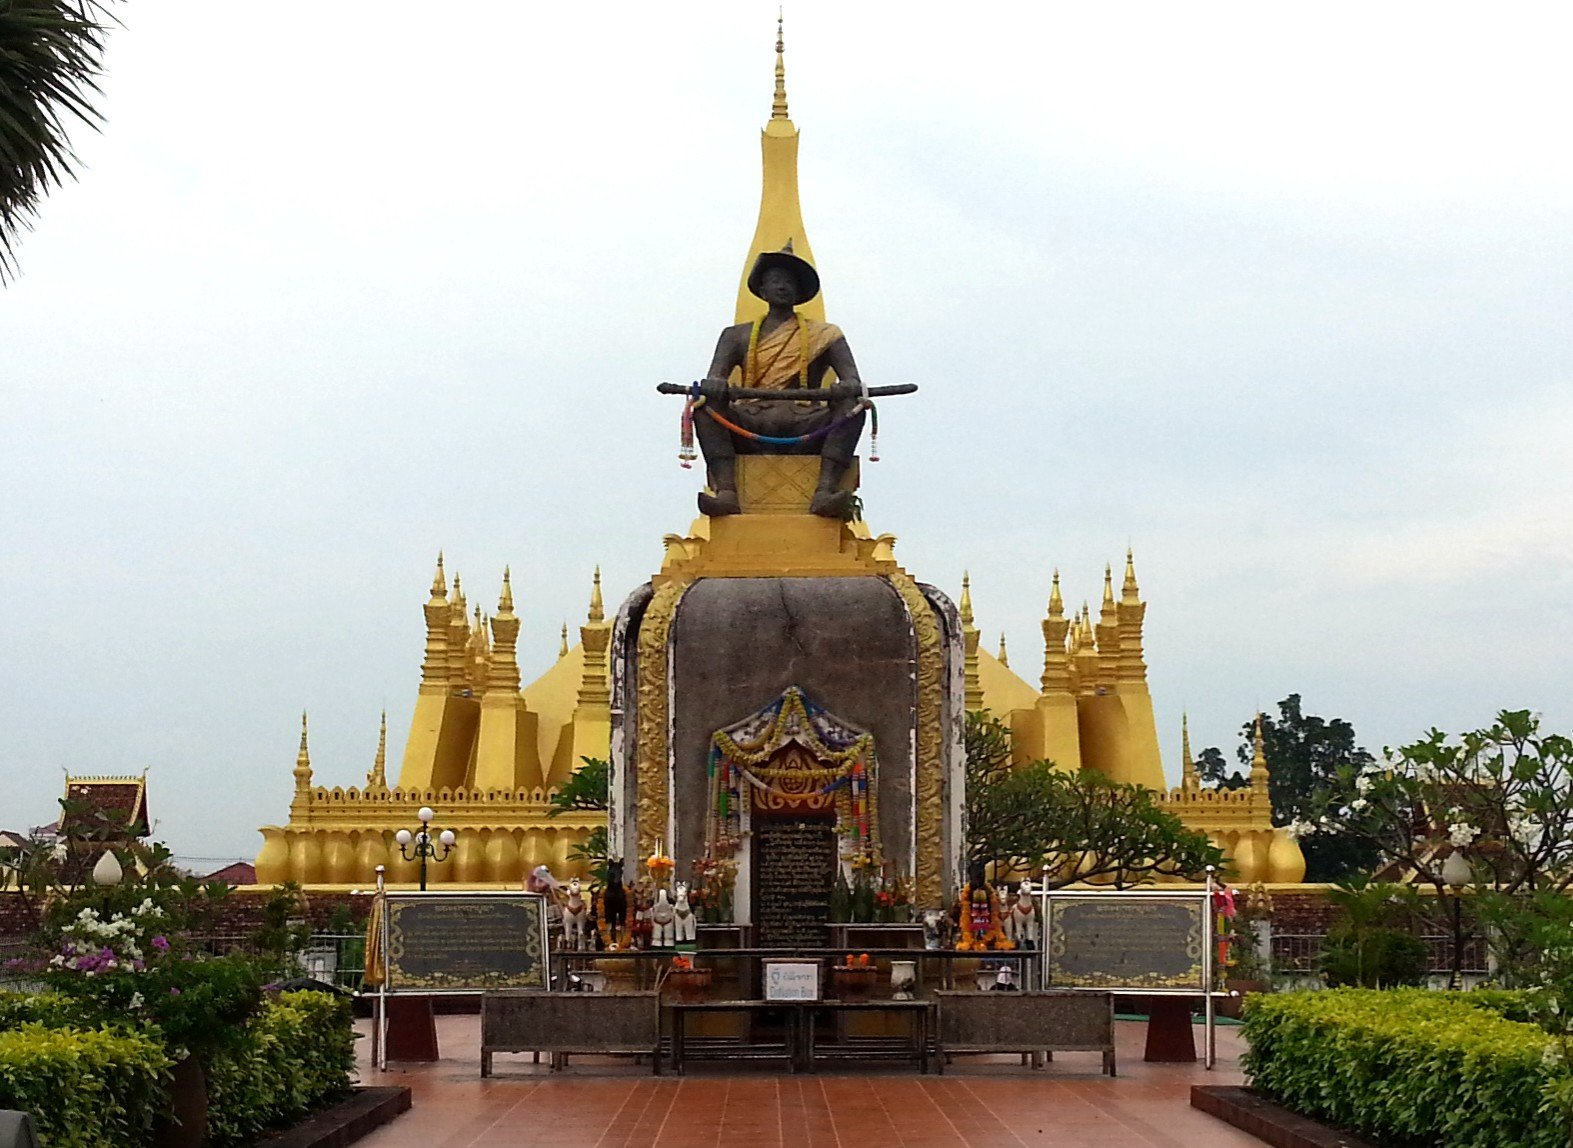 Statue of King Setthathirat